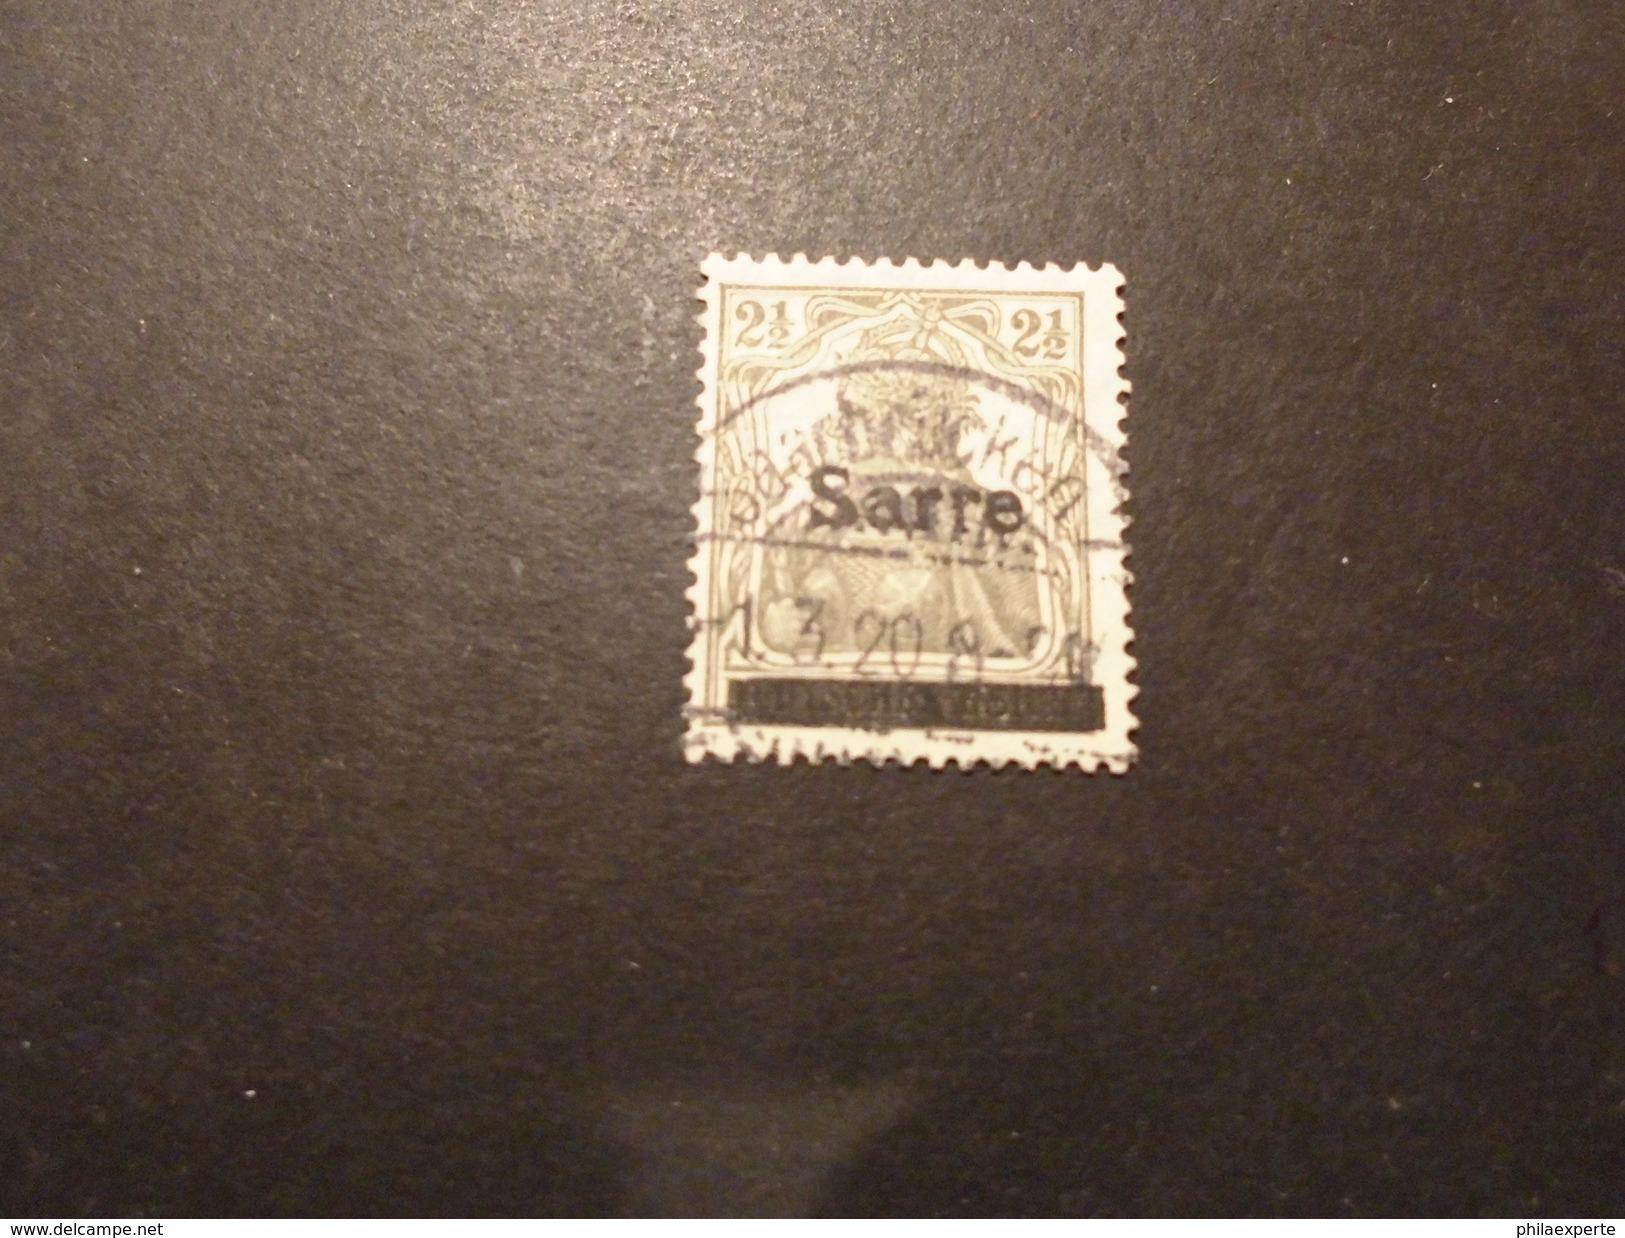 Saargebiet Mi. 2 Gestempelt S.scan - 1920-35 Saargebiet – Abstimmungsgebiet